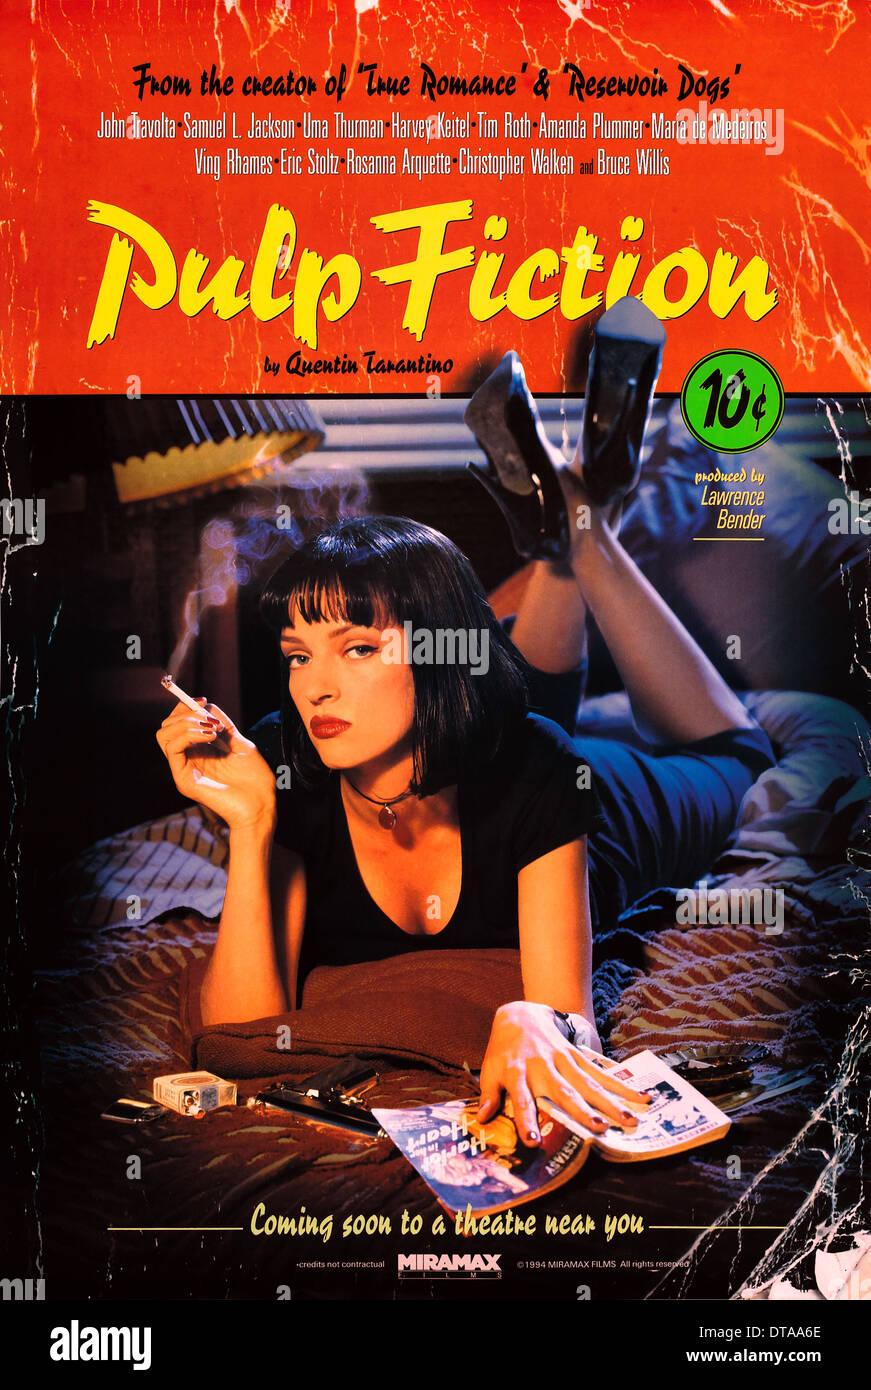 FILM POSTER PULP FICTION 20 Stockfotografie   Alamy